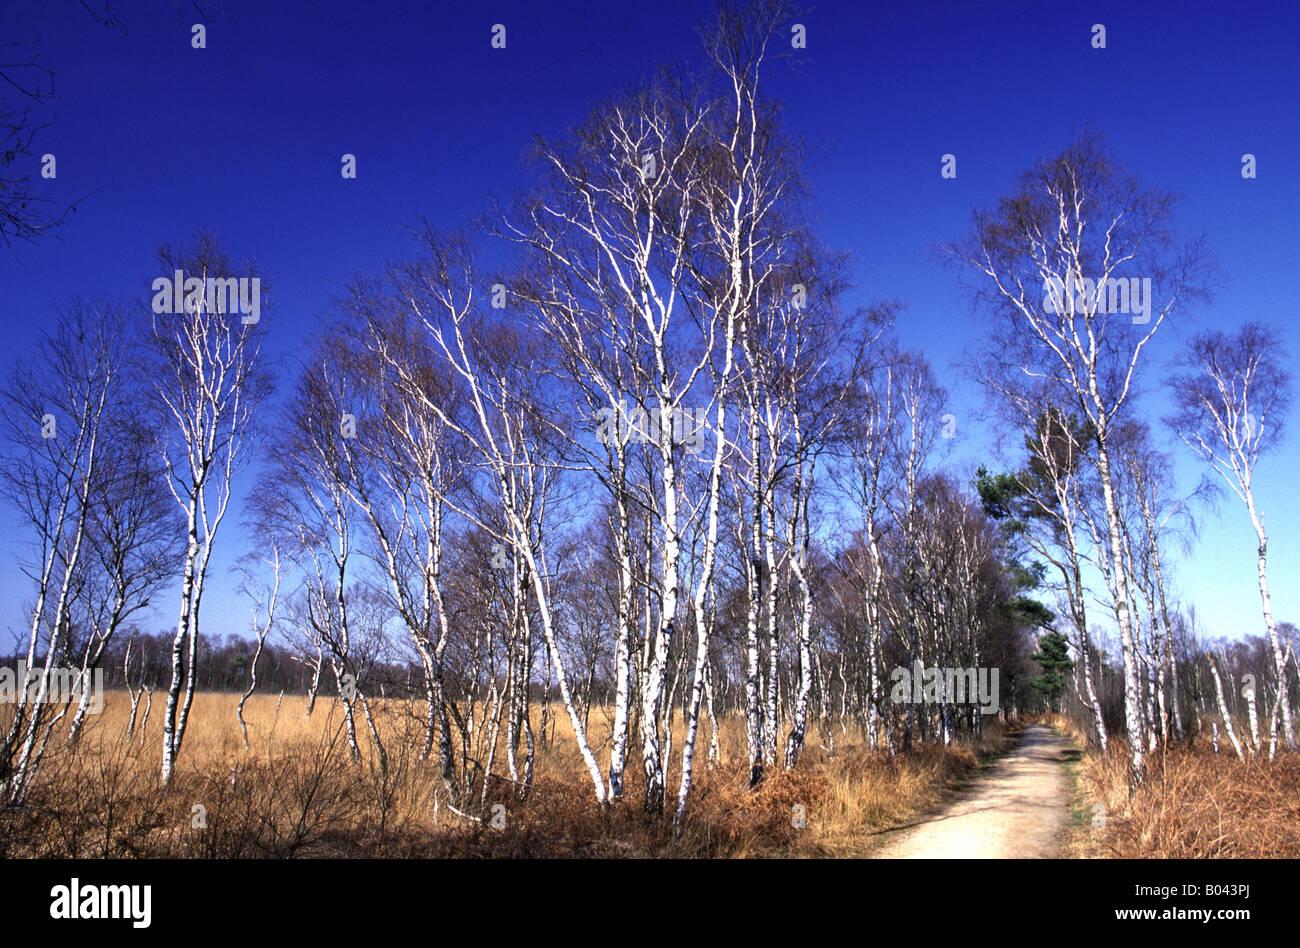 Moorbirken NP Groote Peel Holland birke betula birch bouleau betula Stock Photo